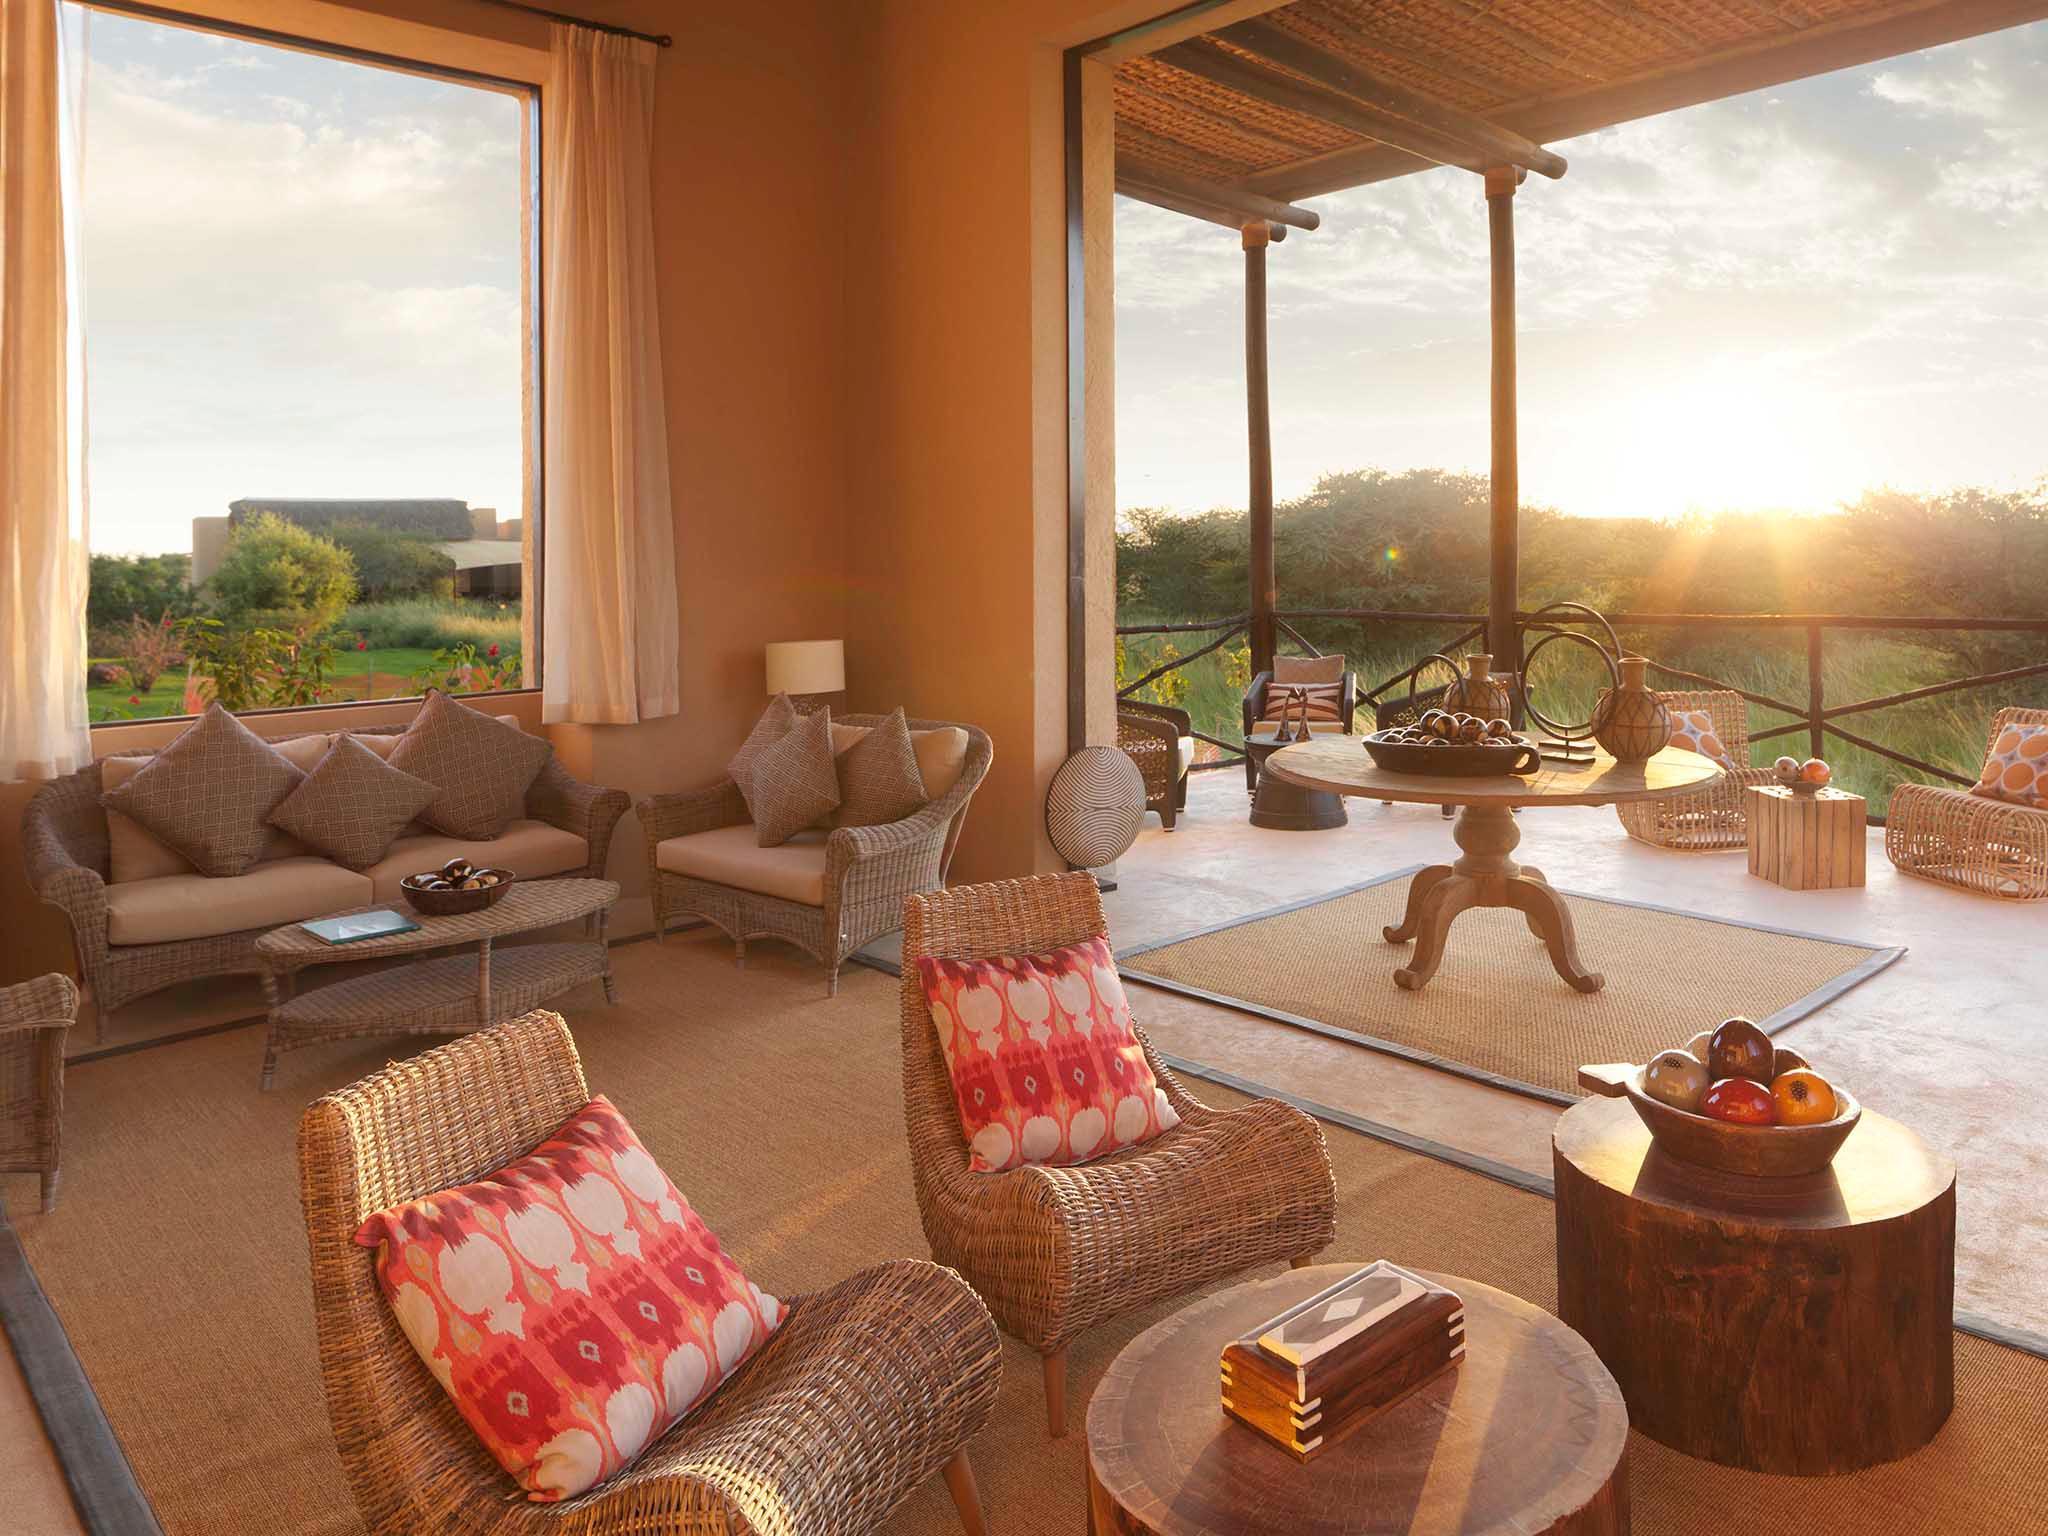 Anantara Sir Bani Yas Island Al Sahel Villa Resort – Sir Baniyas Island 5